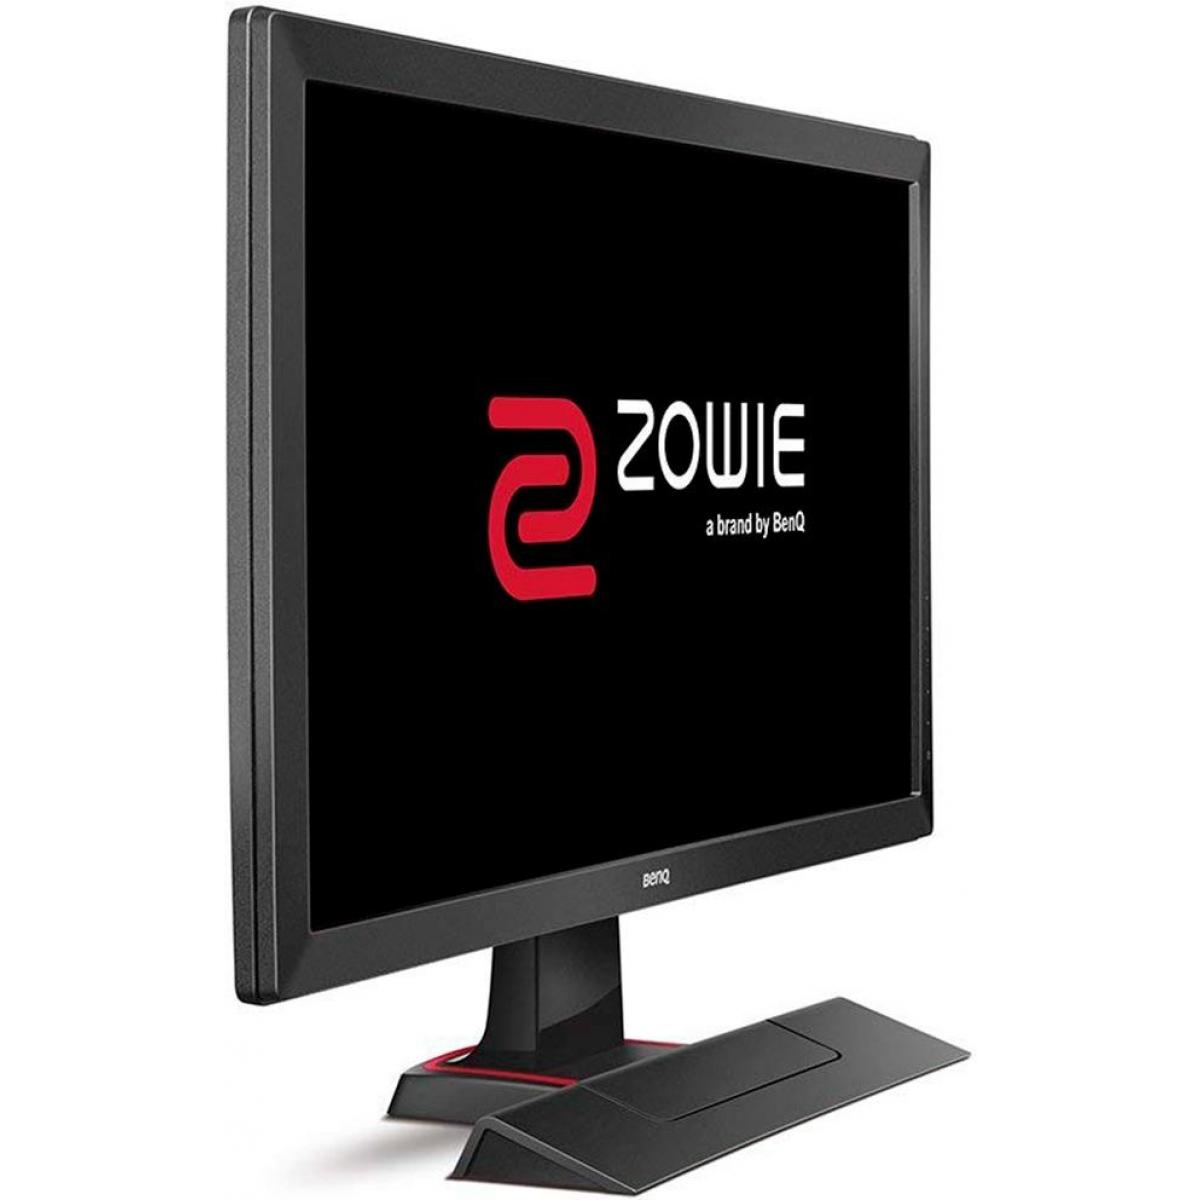 Monitor Gamer Benq Zowie 24 Pol, Full HD, 60Hz, 1ms, RL2455S